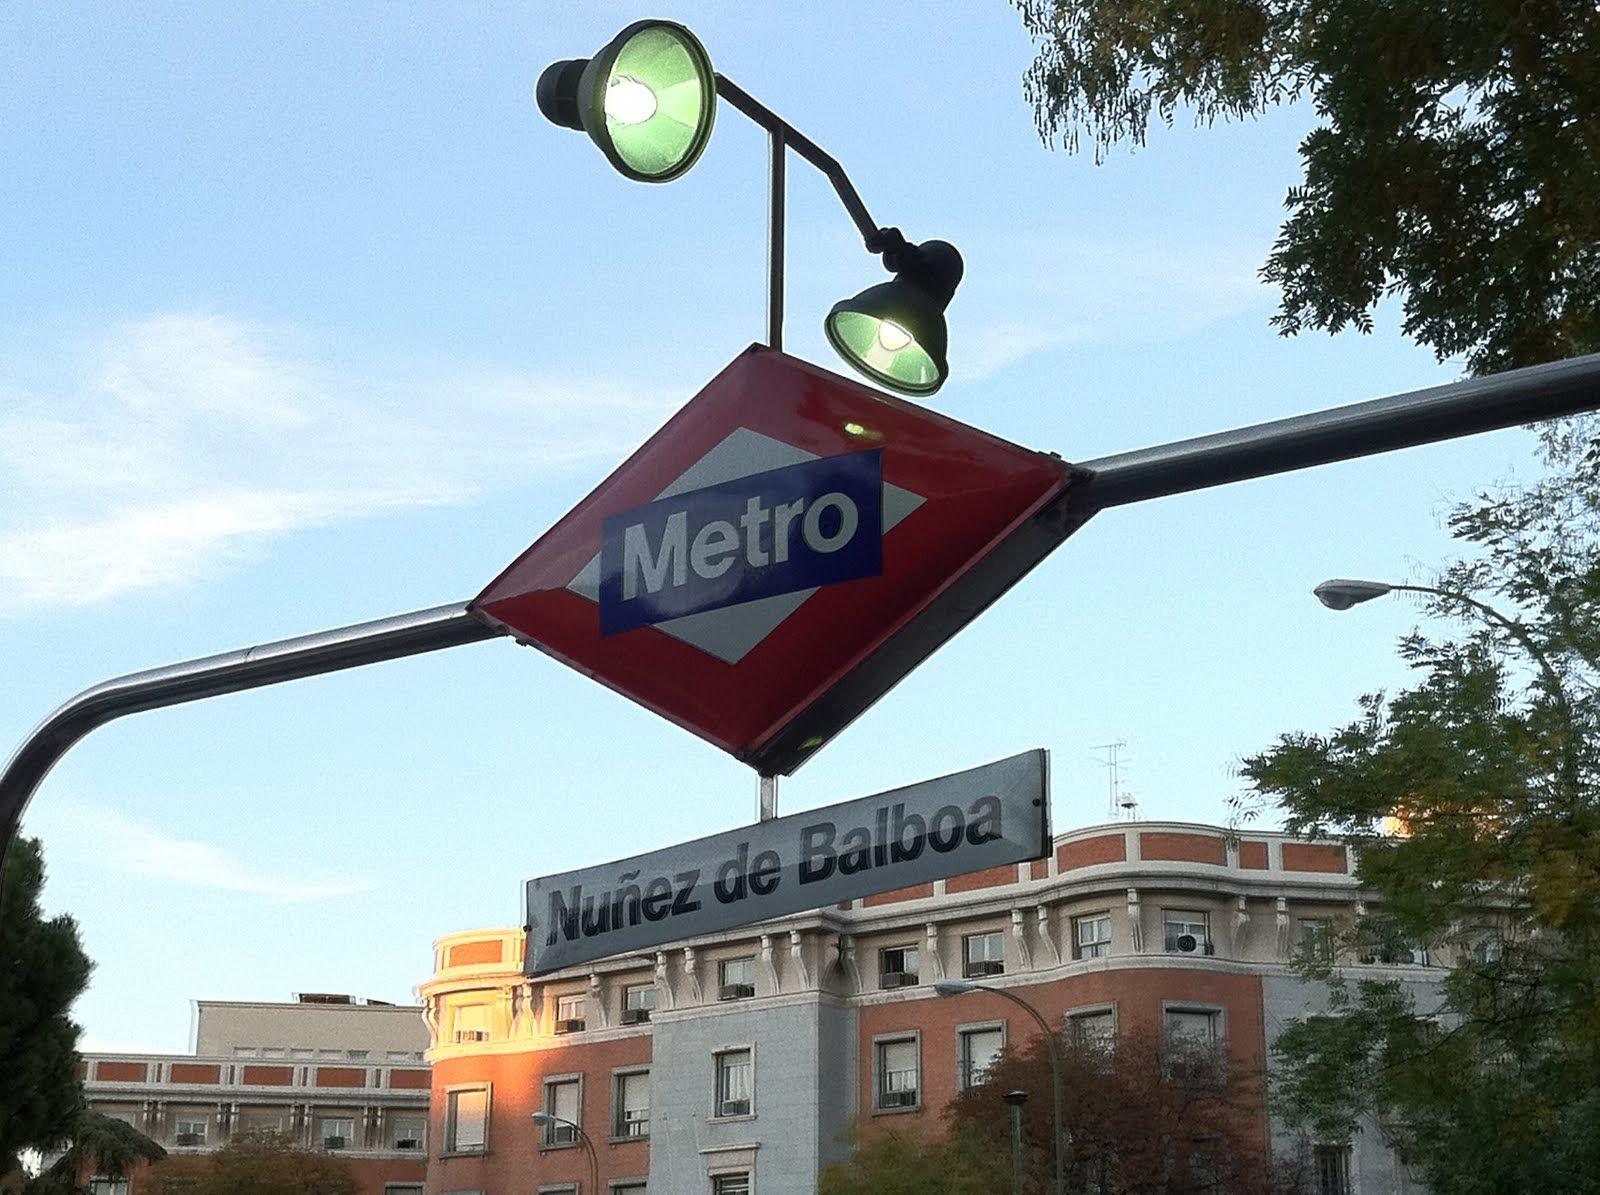 Metro Nuñez de Balboa. #Madrid